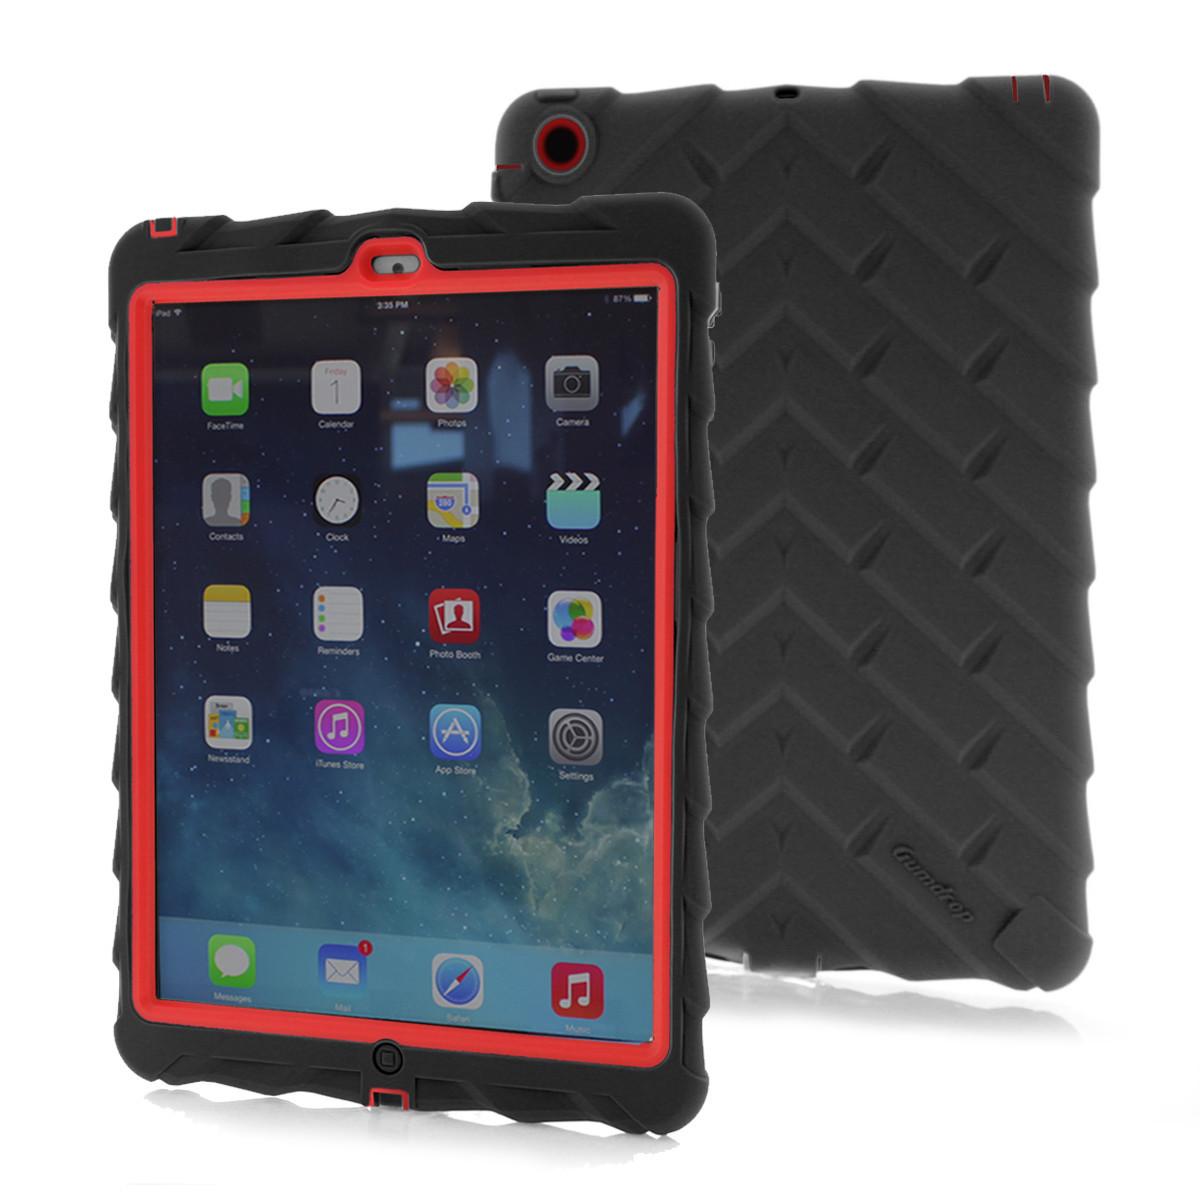 gumdrop cases droptech apple ipad air rugged tablet case. Black Bedroom Furniture Sets. Home Design Ideas